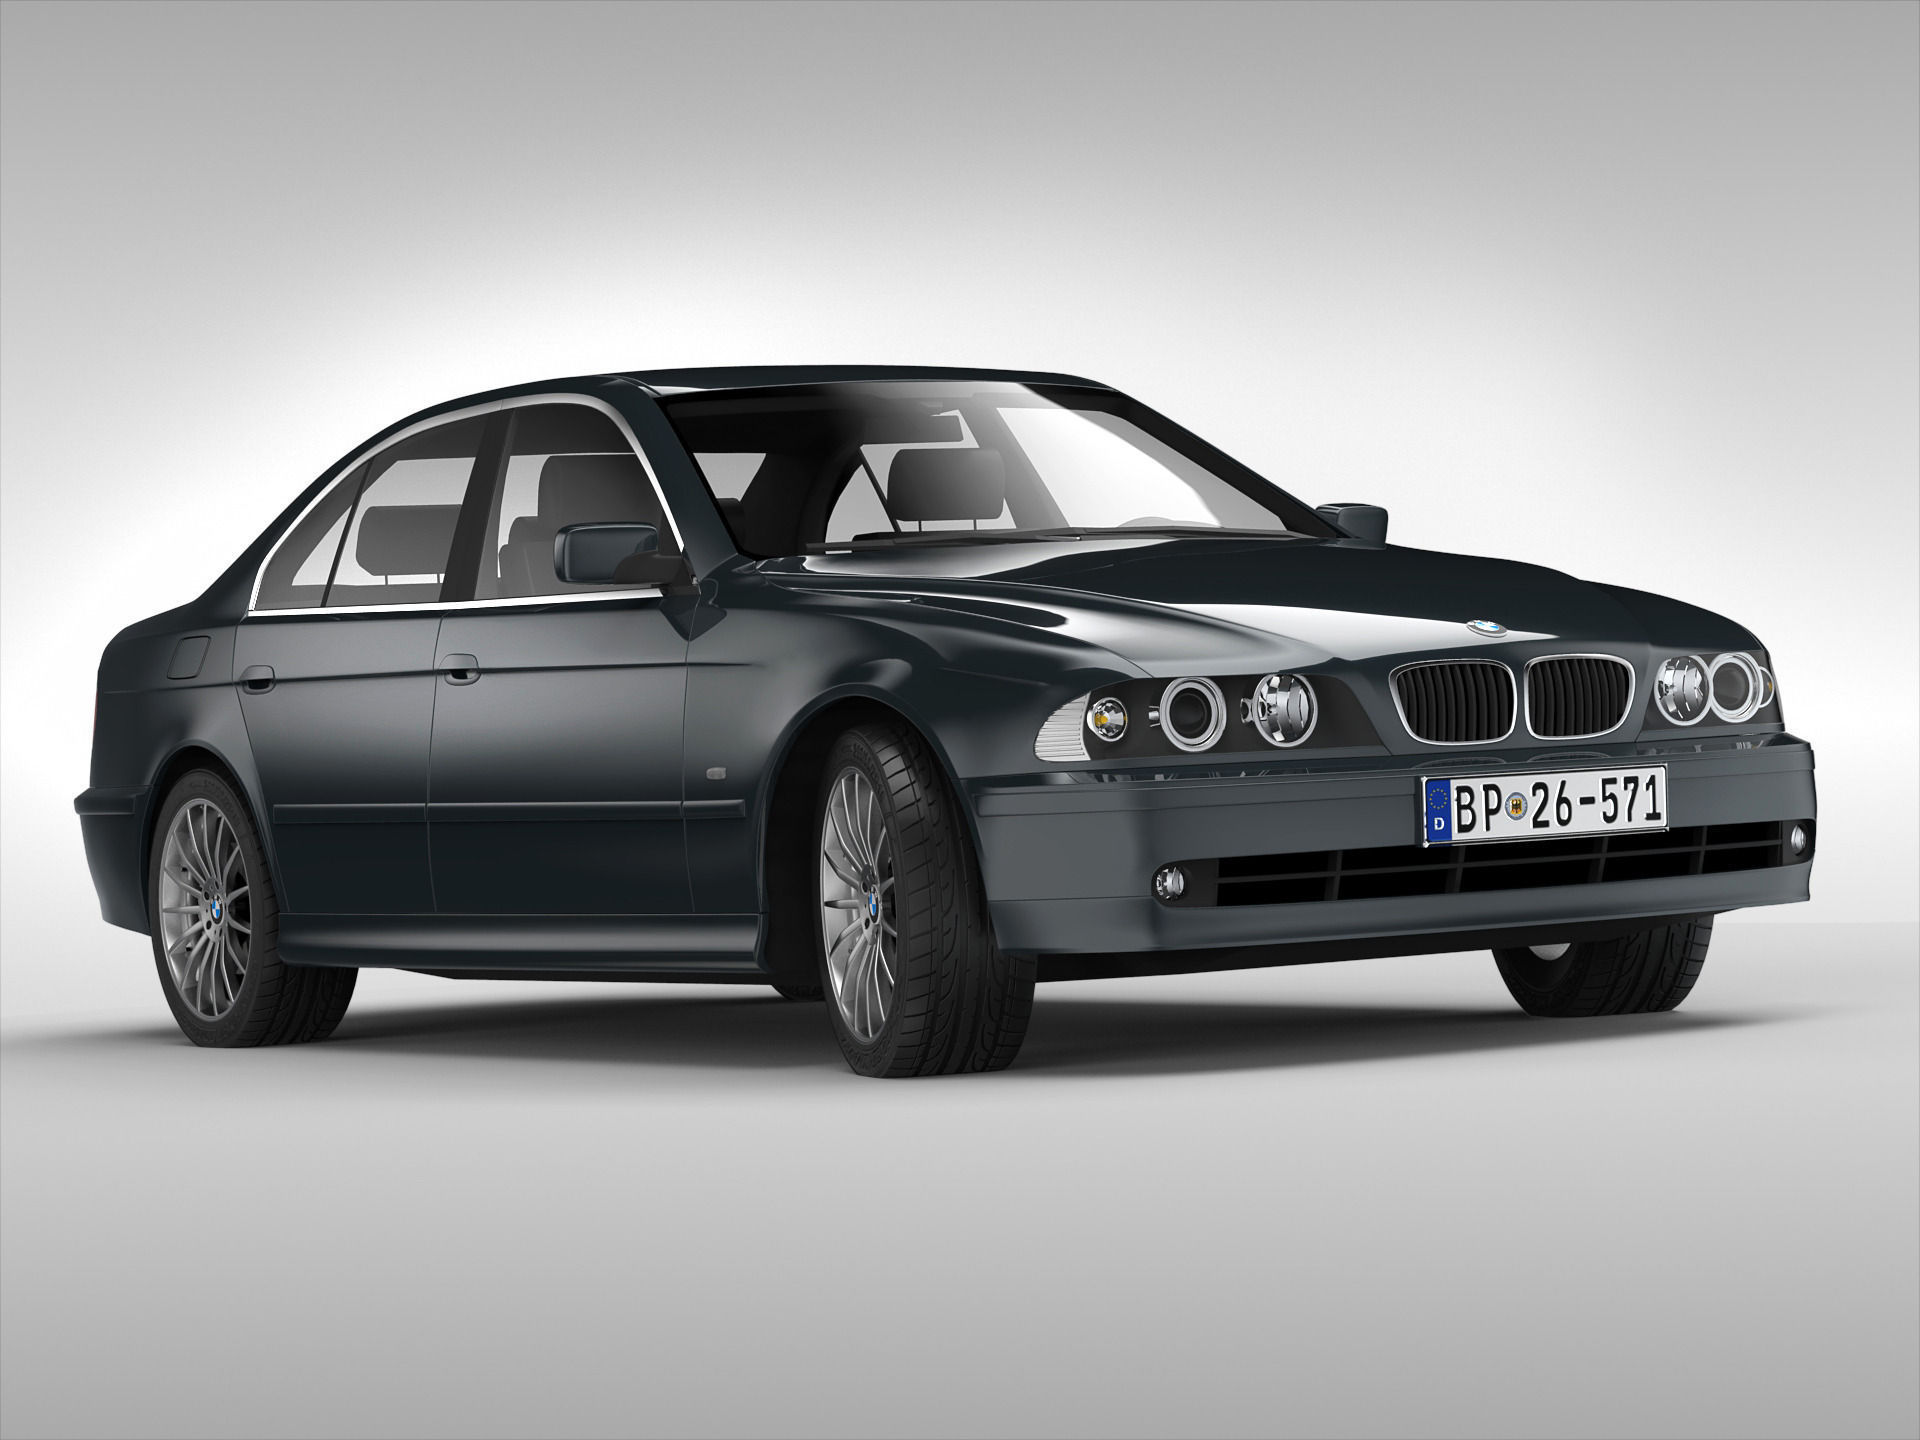 Bmw Series E D Model Max Obj Ds Fbx on All Car Body Parts Named